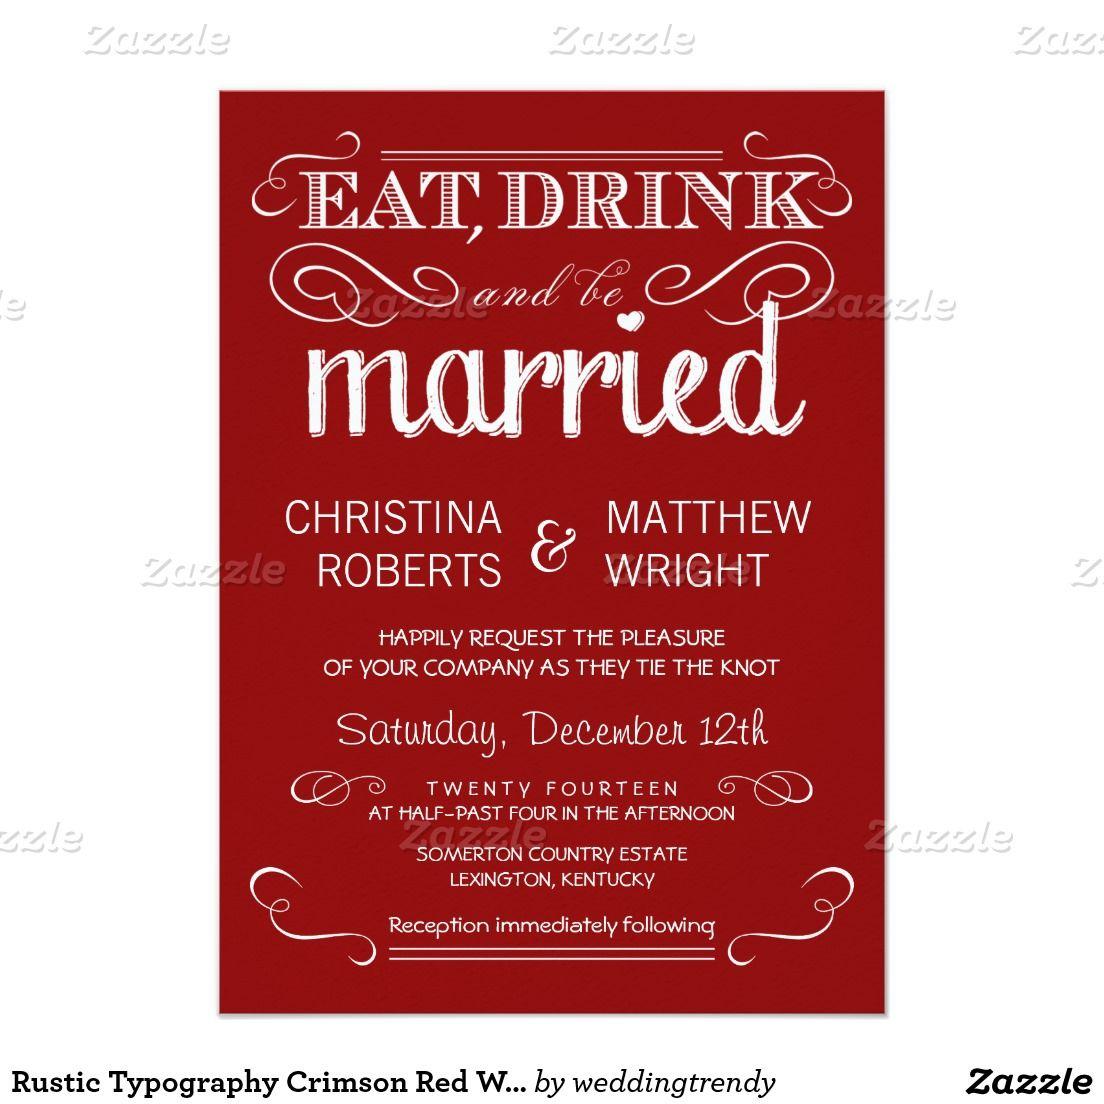 Rustic Typography Crimson Red Wedding Invitations   WEDDING ...